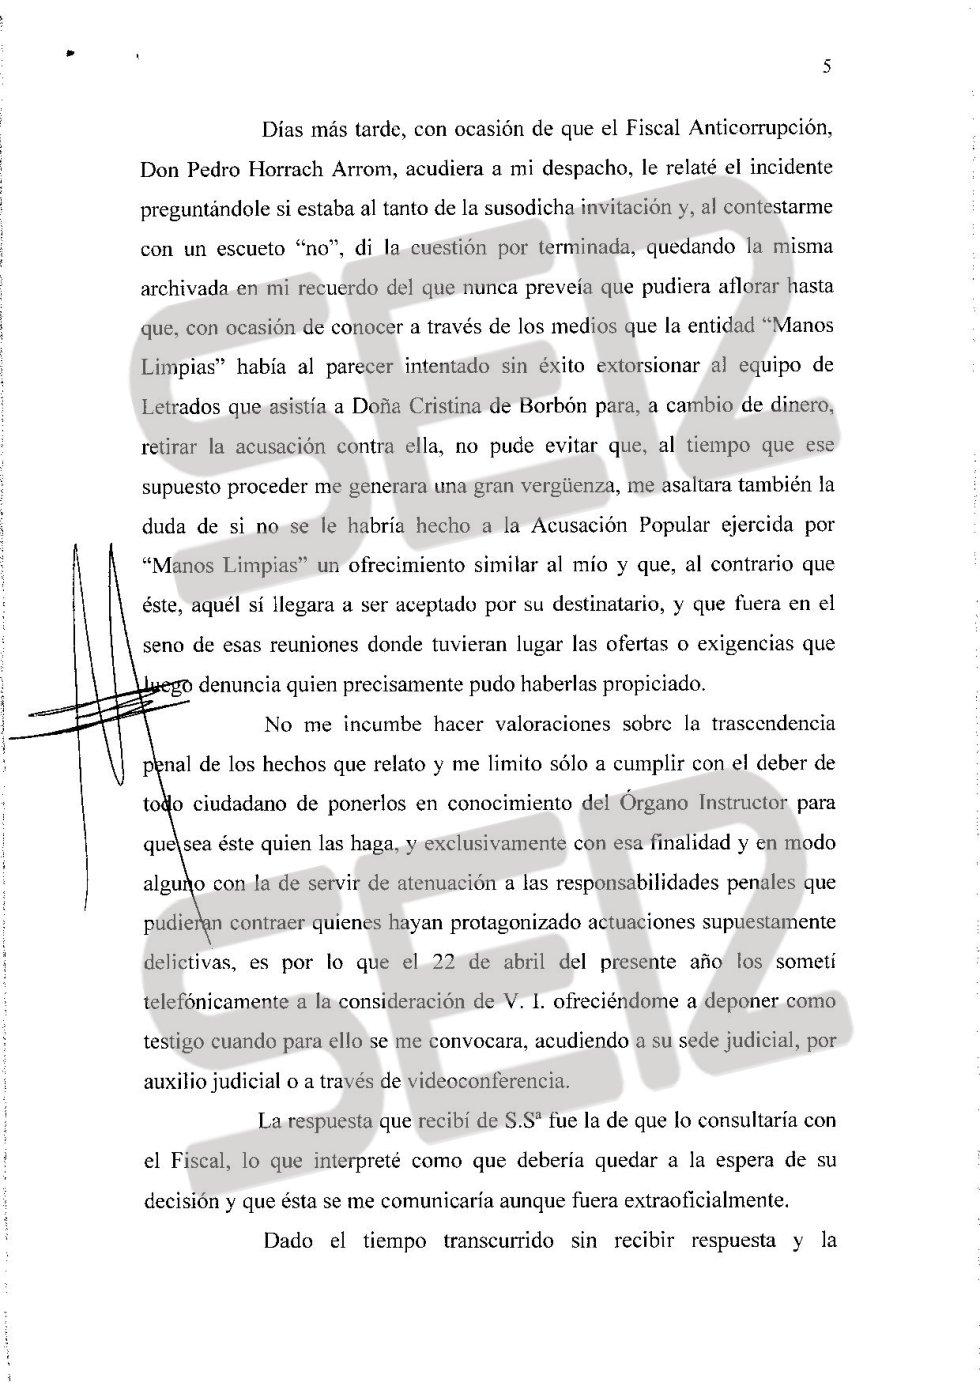 Carta íntegra de José Castro a Santiago Pedraz (página 5/6).